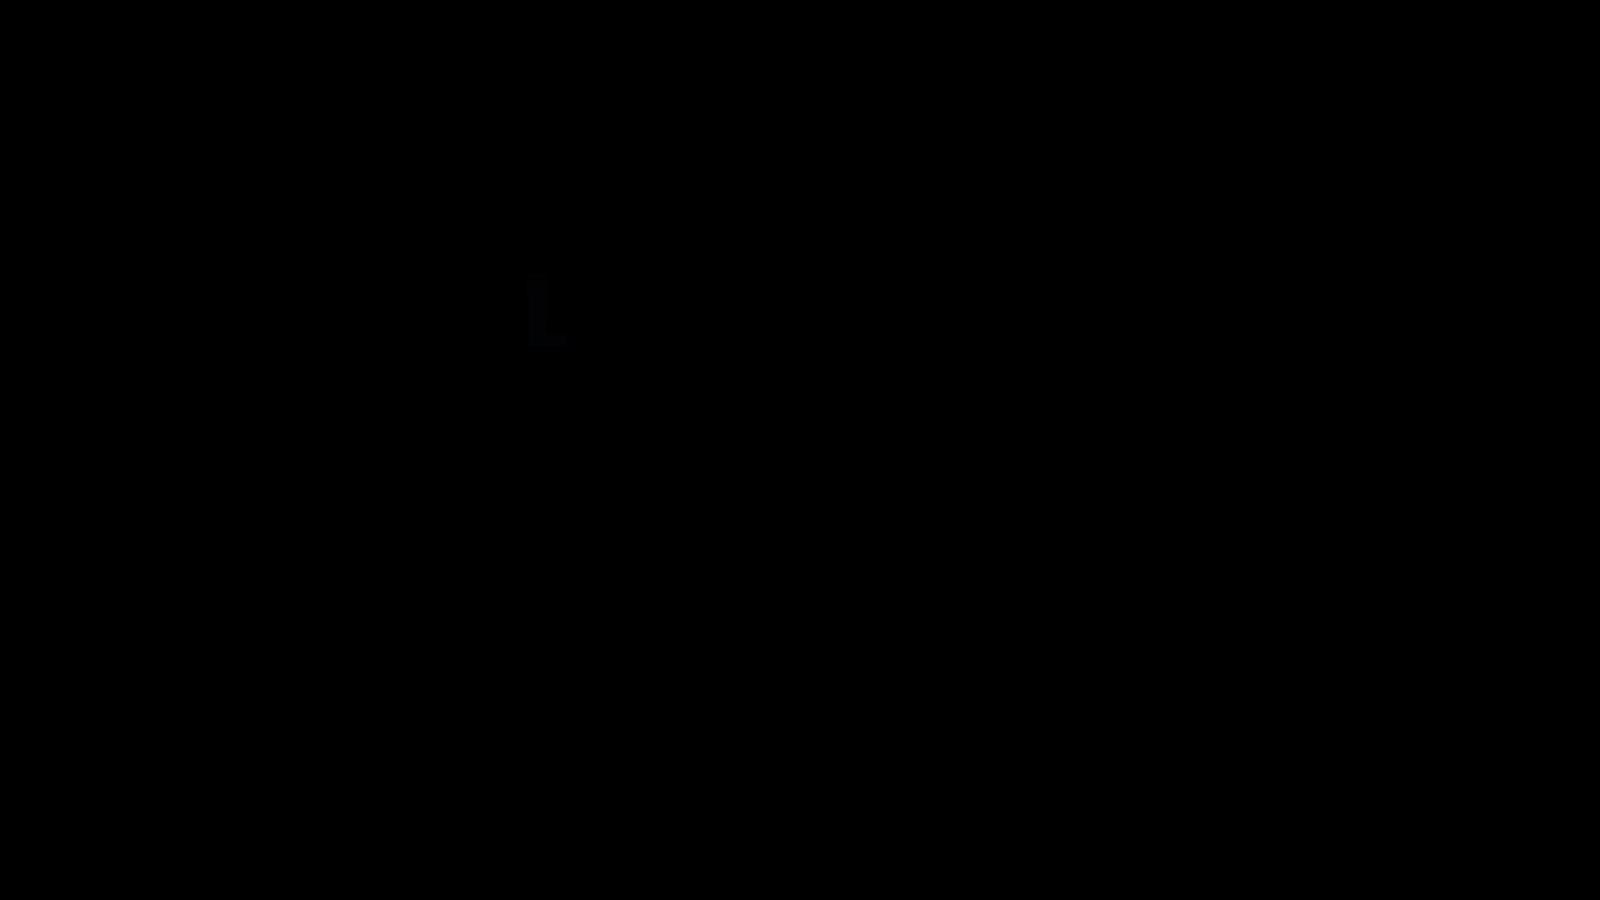 【KINGDOM HEARTS III】TGS 2018 Trailer Short Ver. 002